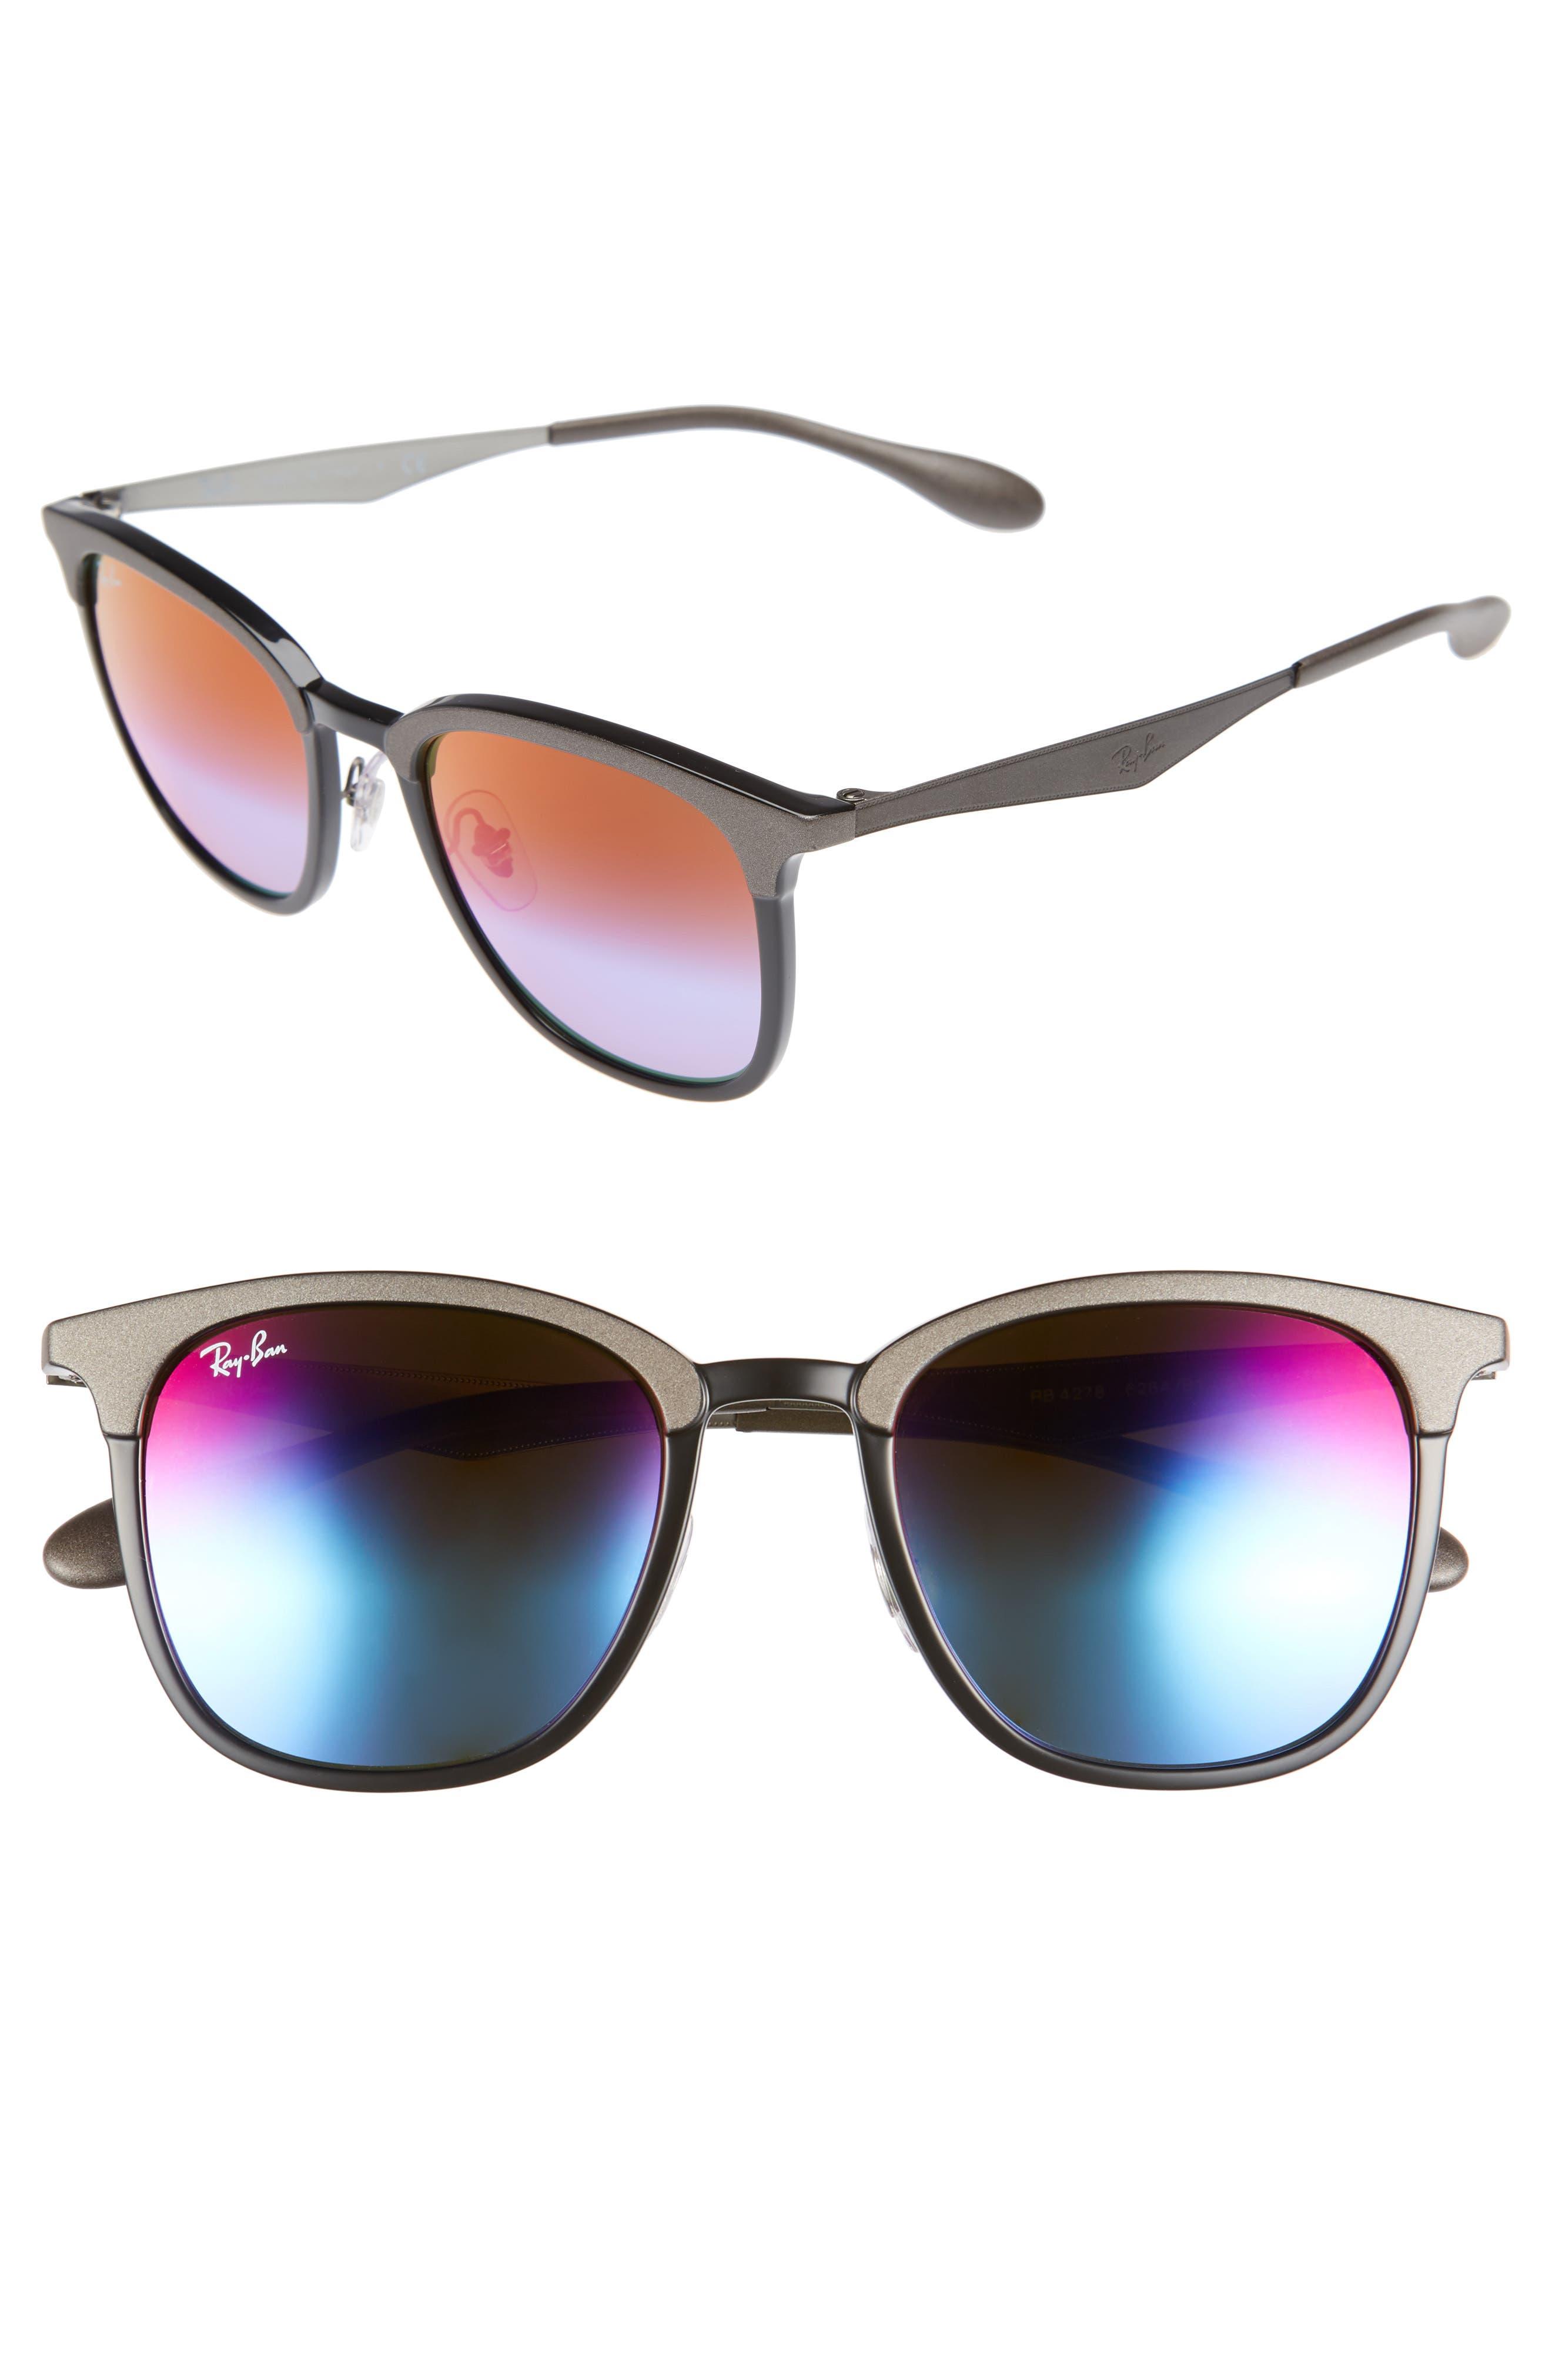 Ray-Ban Highstreet 51mm Sunglasses